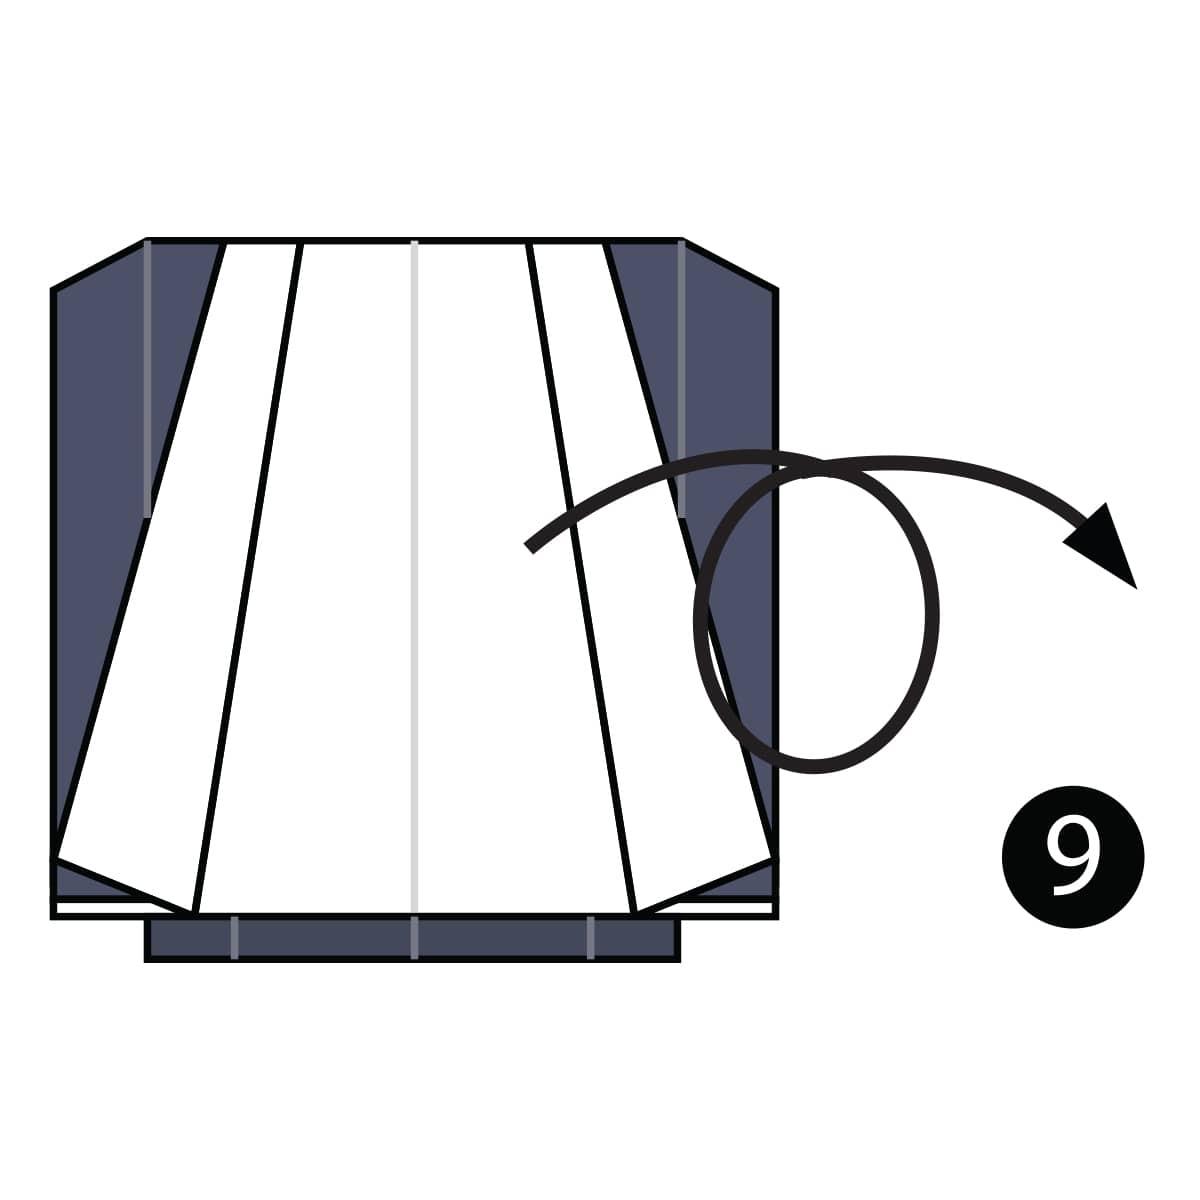 Tuxedo Step 9